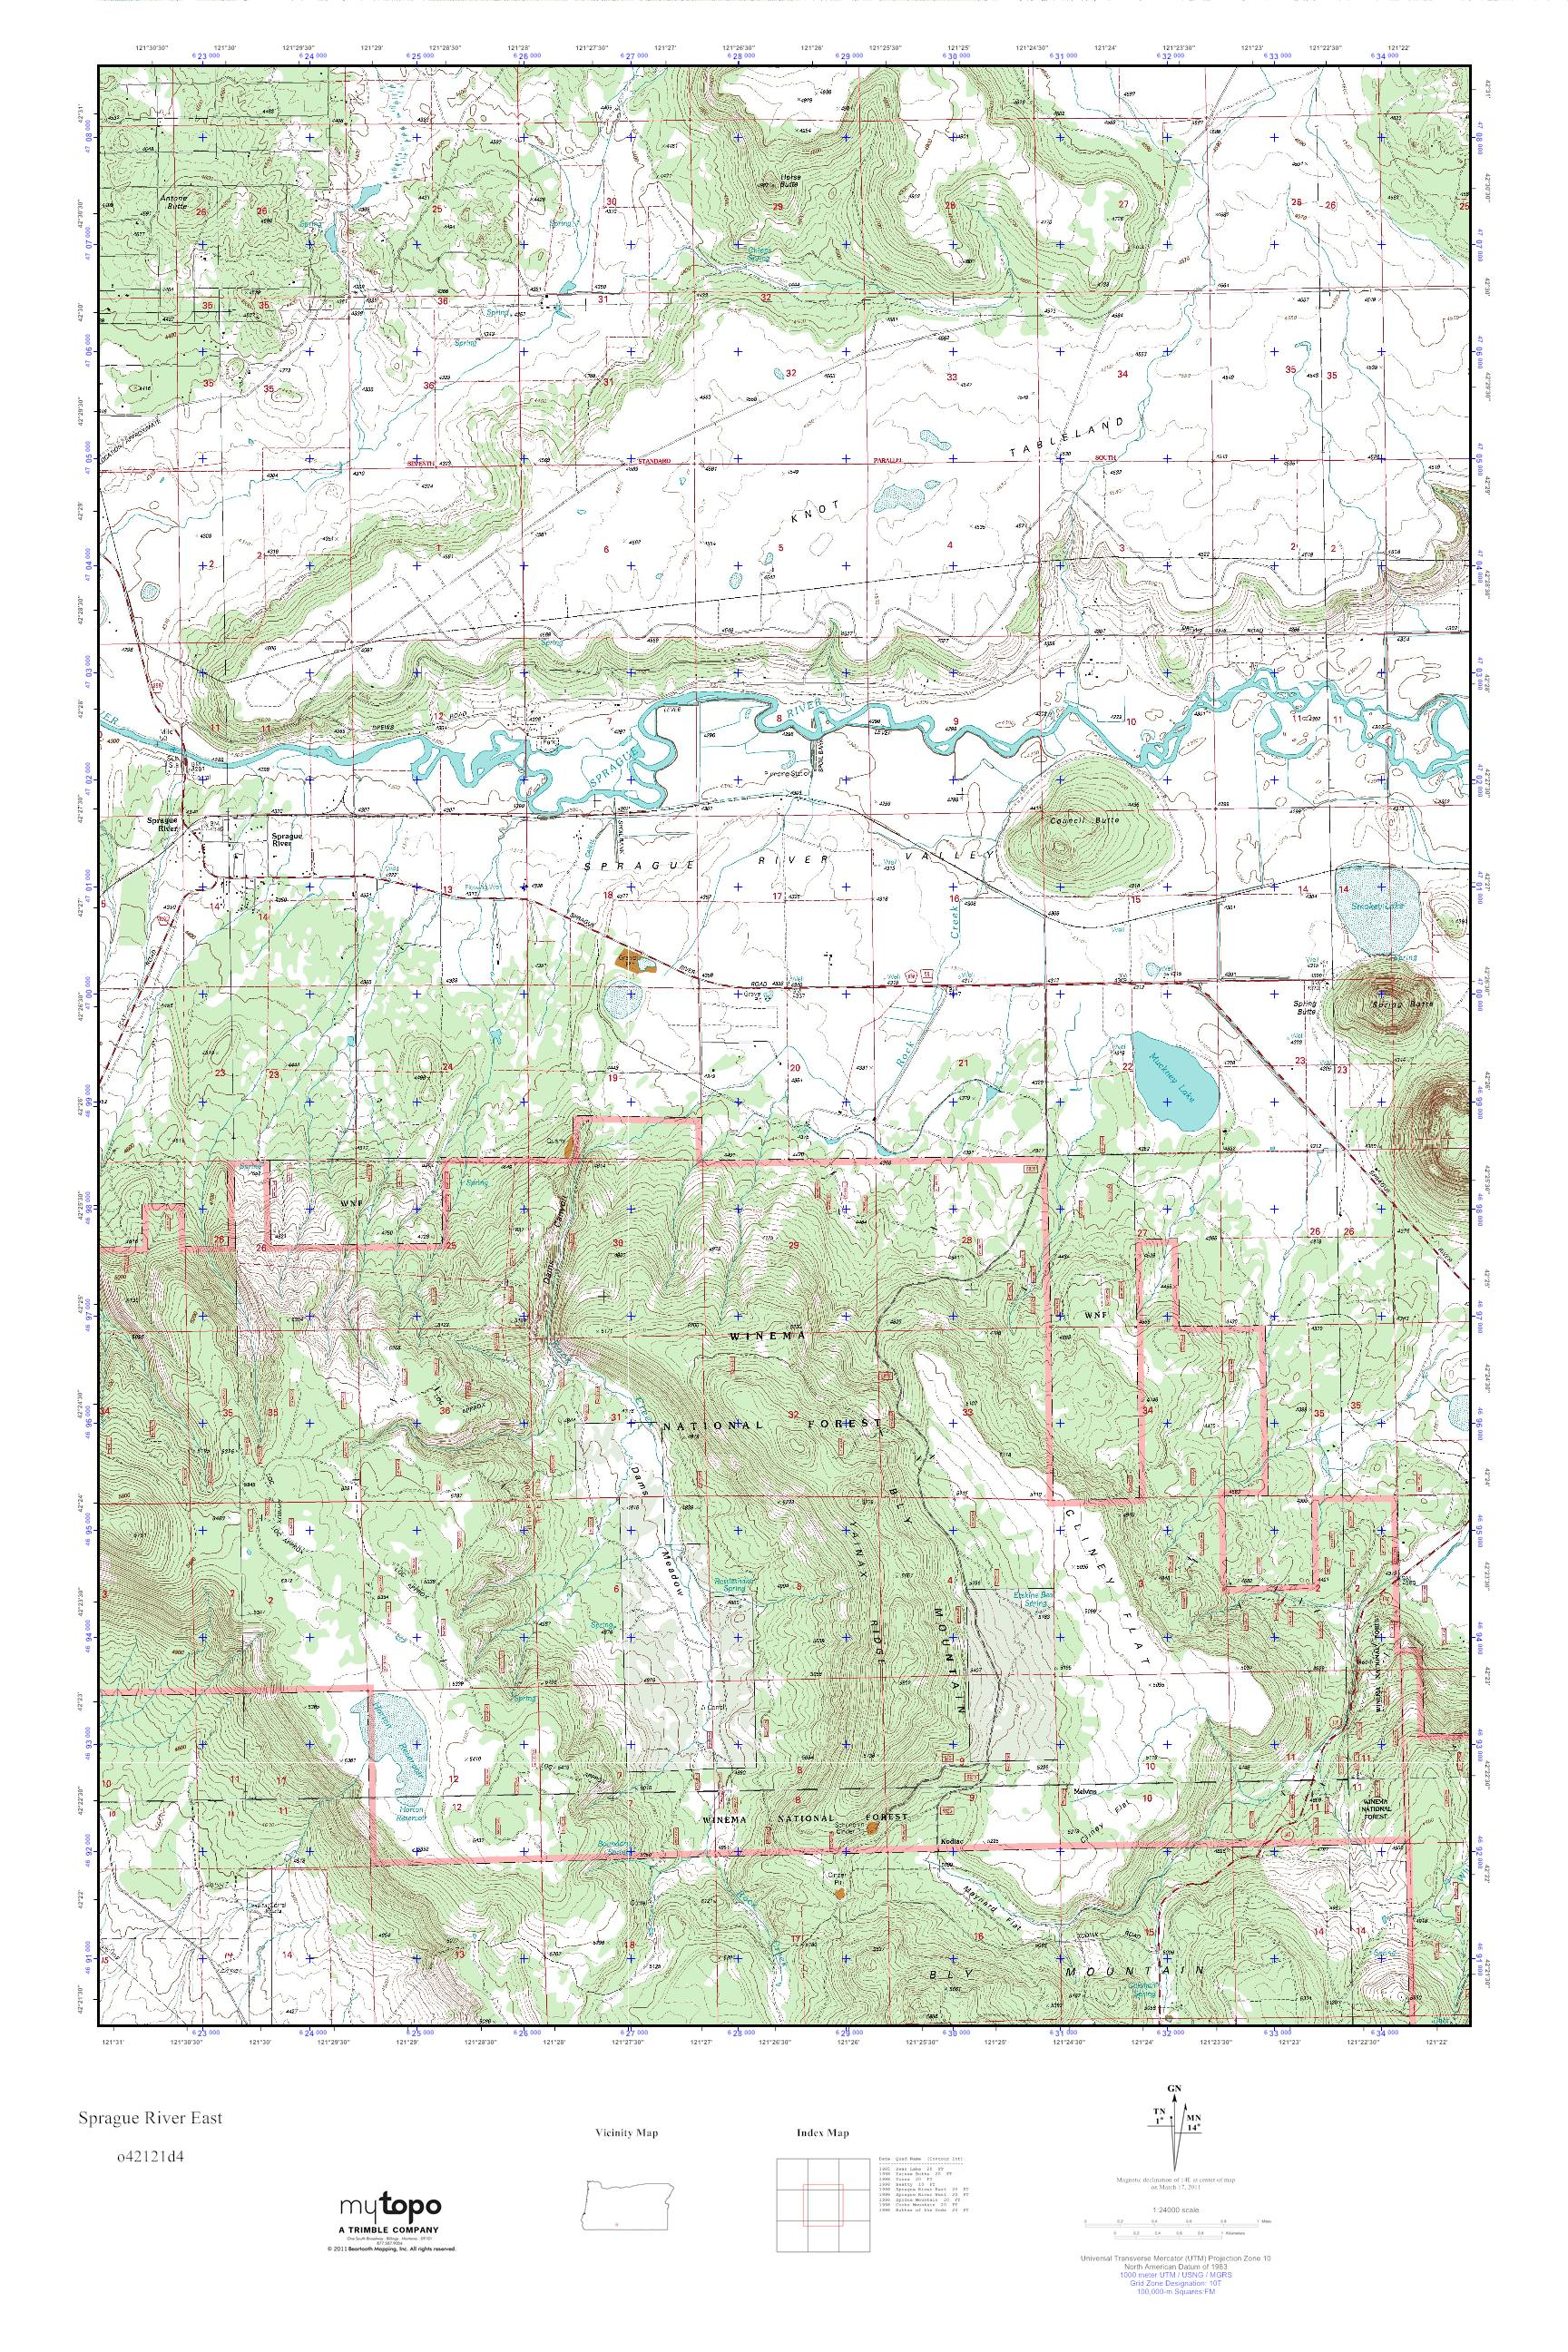 Mytopo Sprague River East Oregon Usgs Quad Topo Map